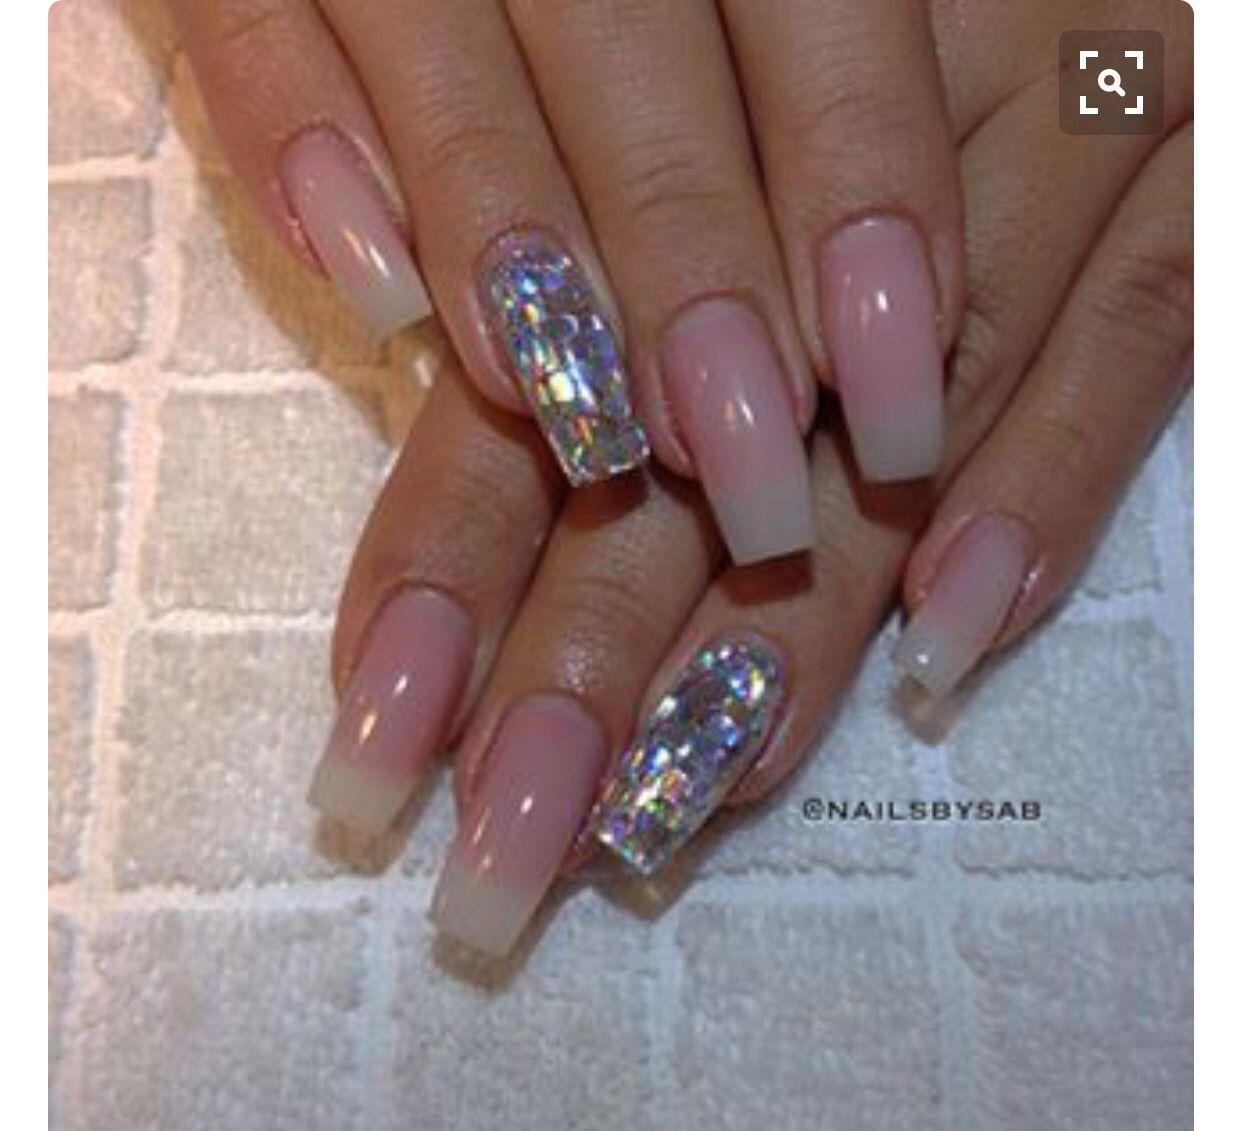 Pin by Elizabeth Florek on Fabulous Nails | Pinterest | Fabulous ...